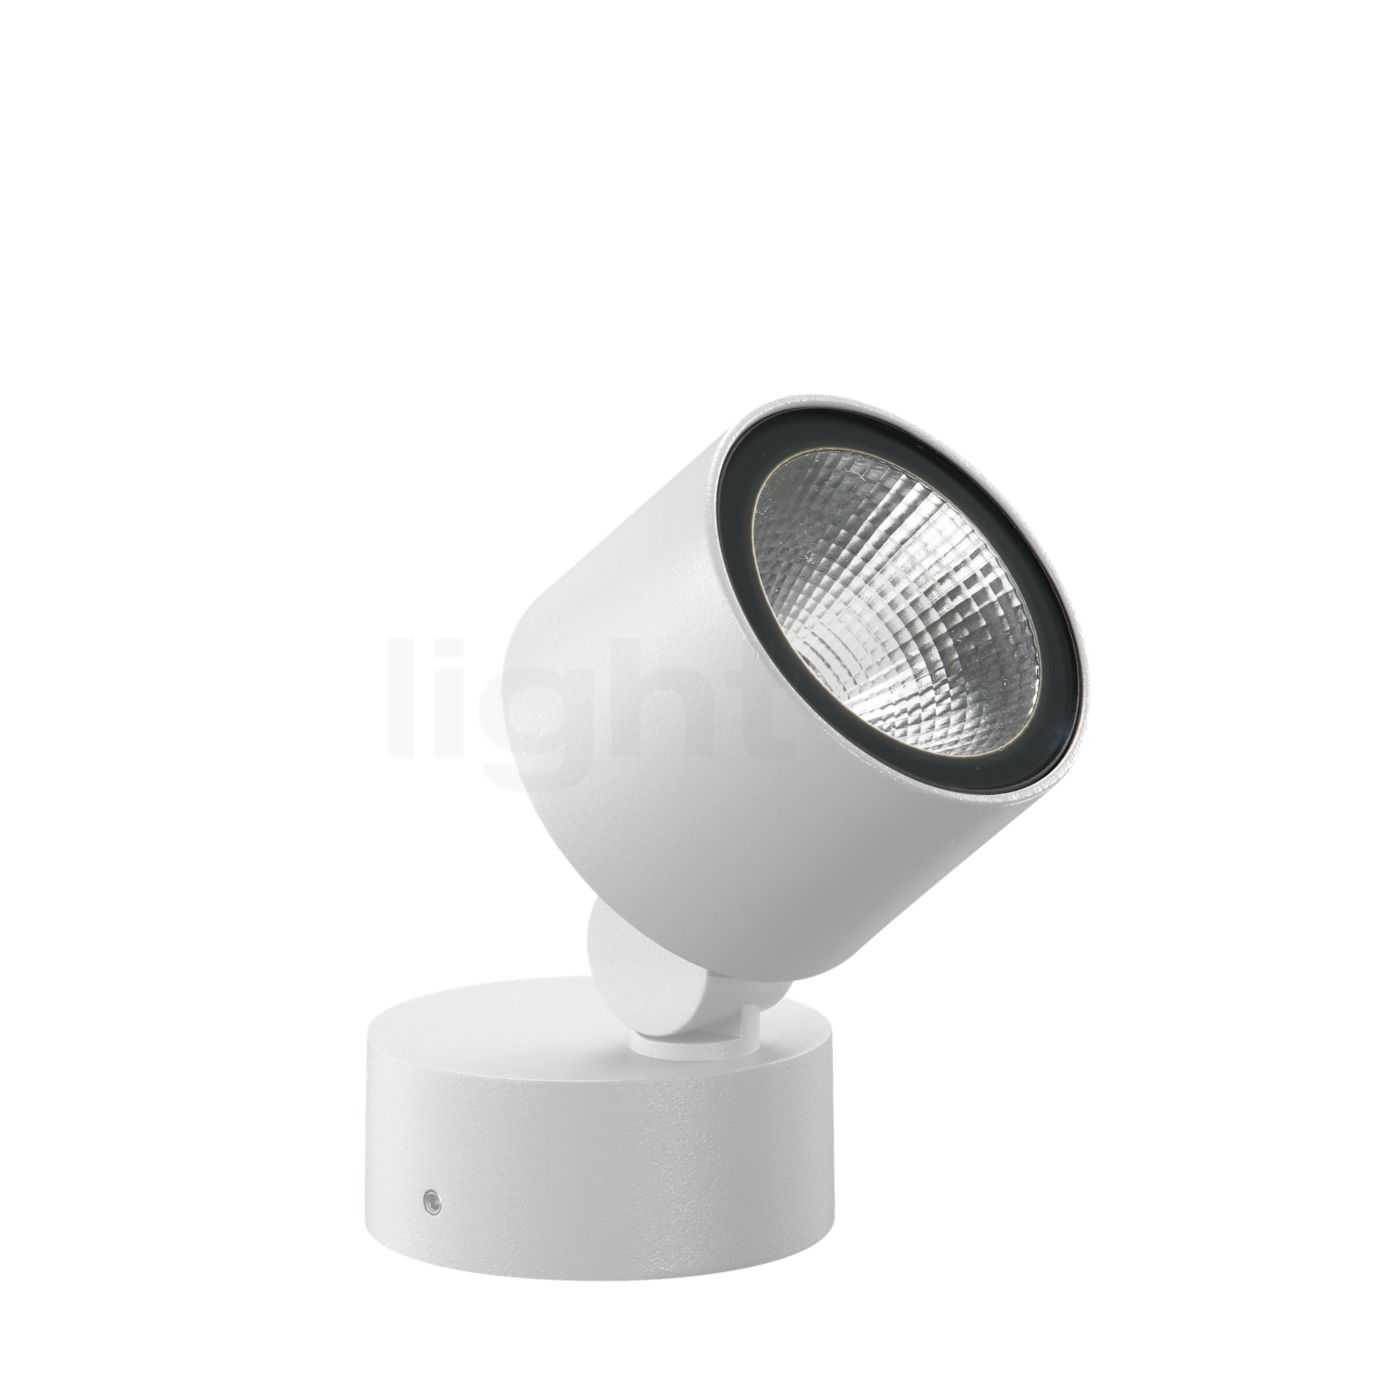 Ares Kirk 90 Spotlight LED Spotlights U0026 Floodlights